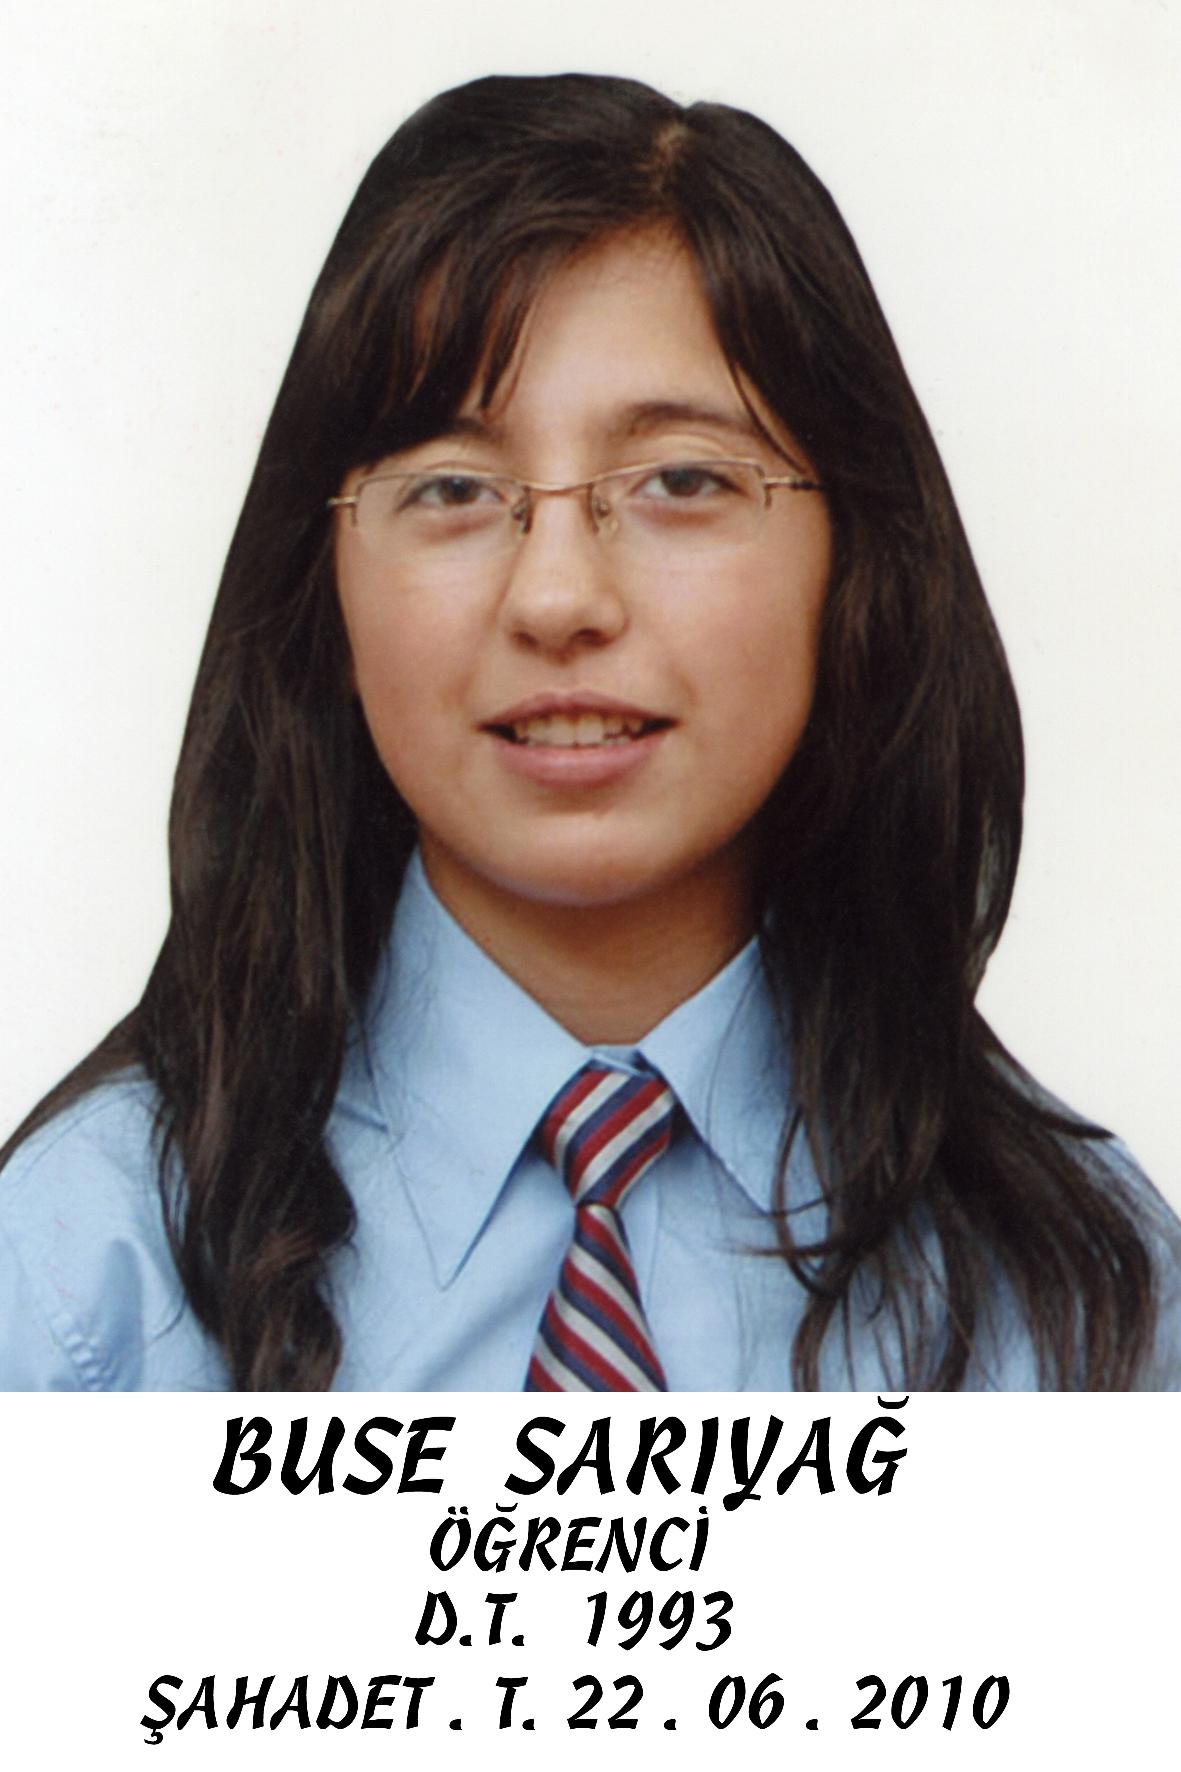 BUSE SARIYAĞ